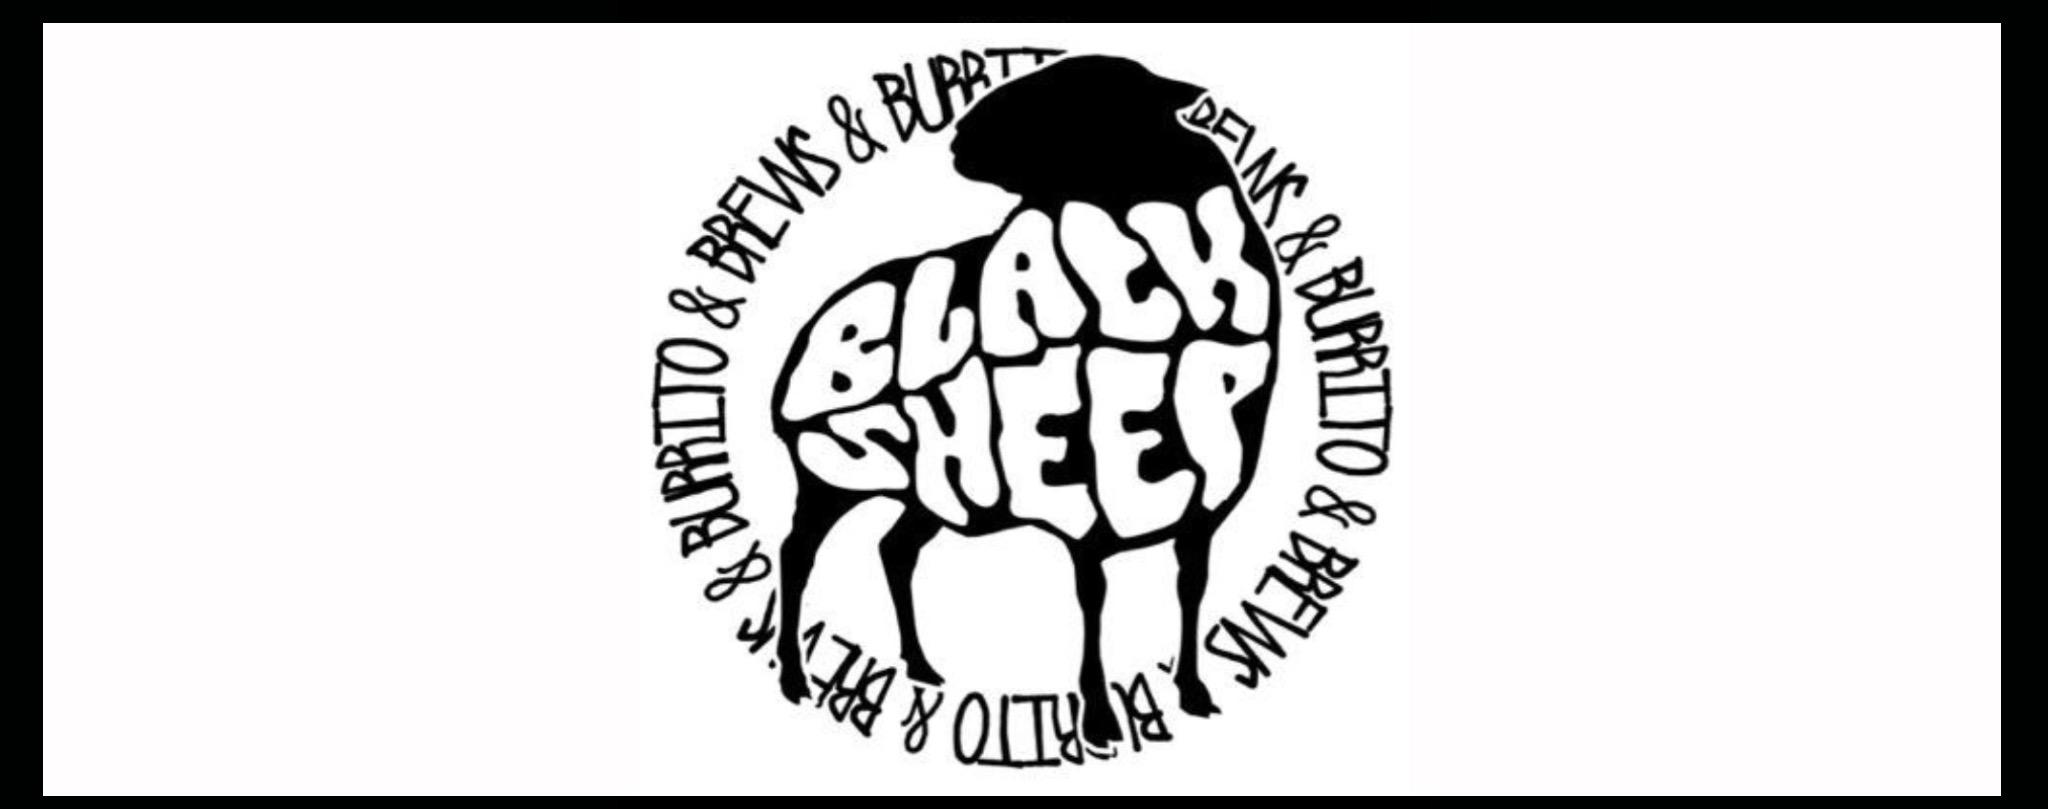 black-sheep-thumbnail.JPG